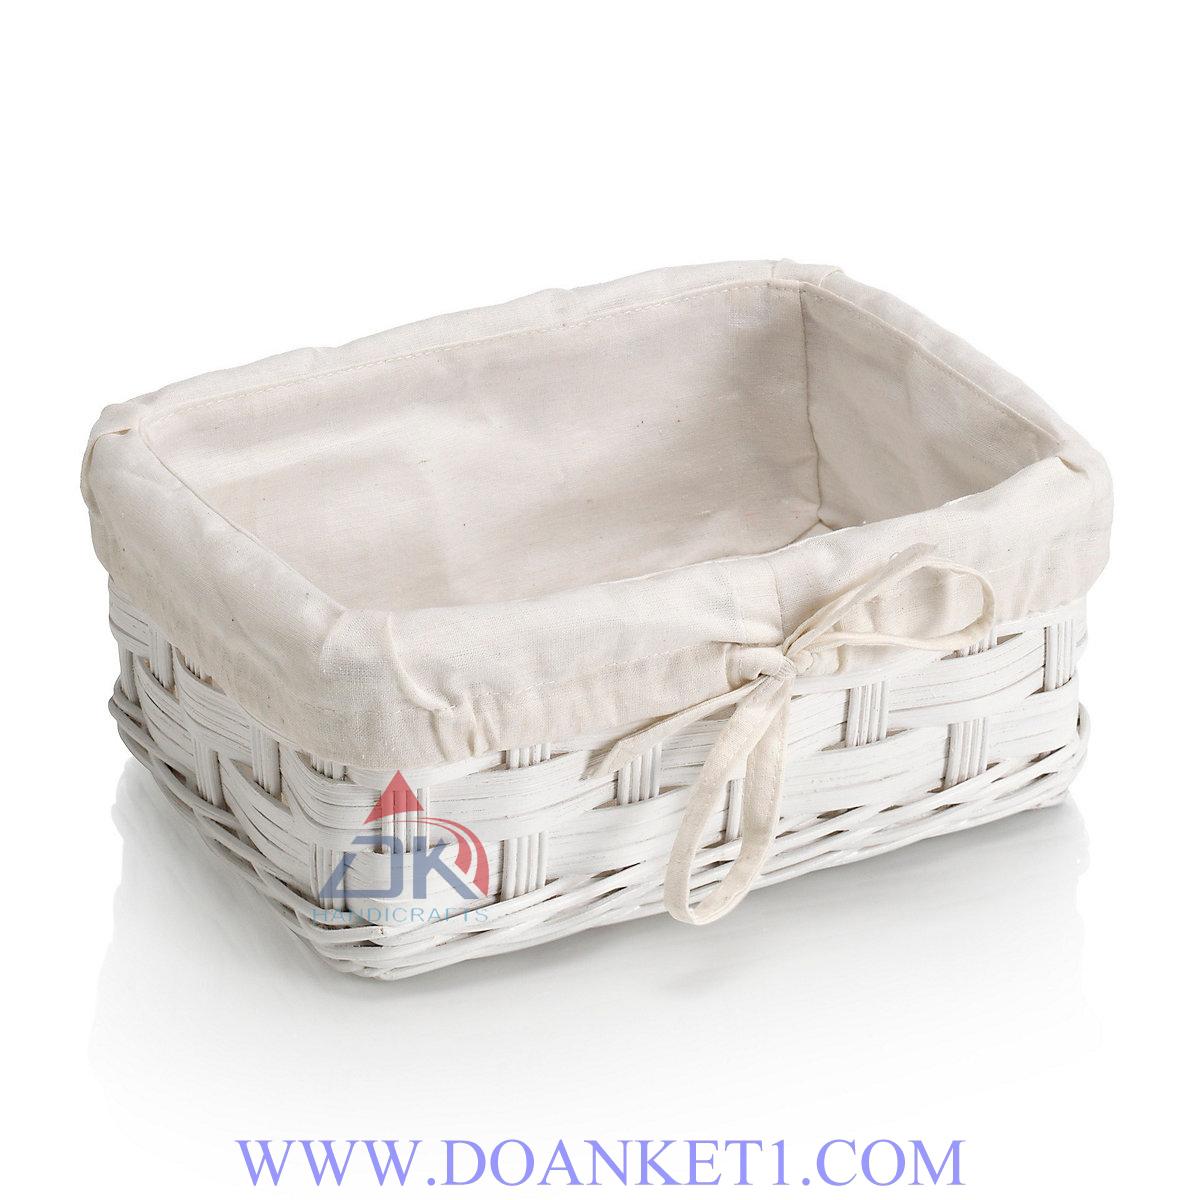 RATTAN BASKET # DK116